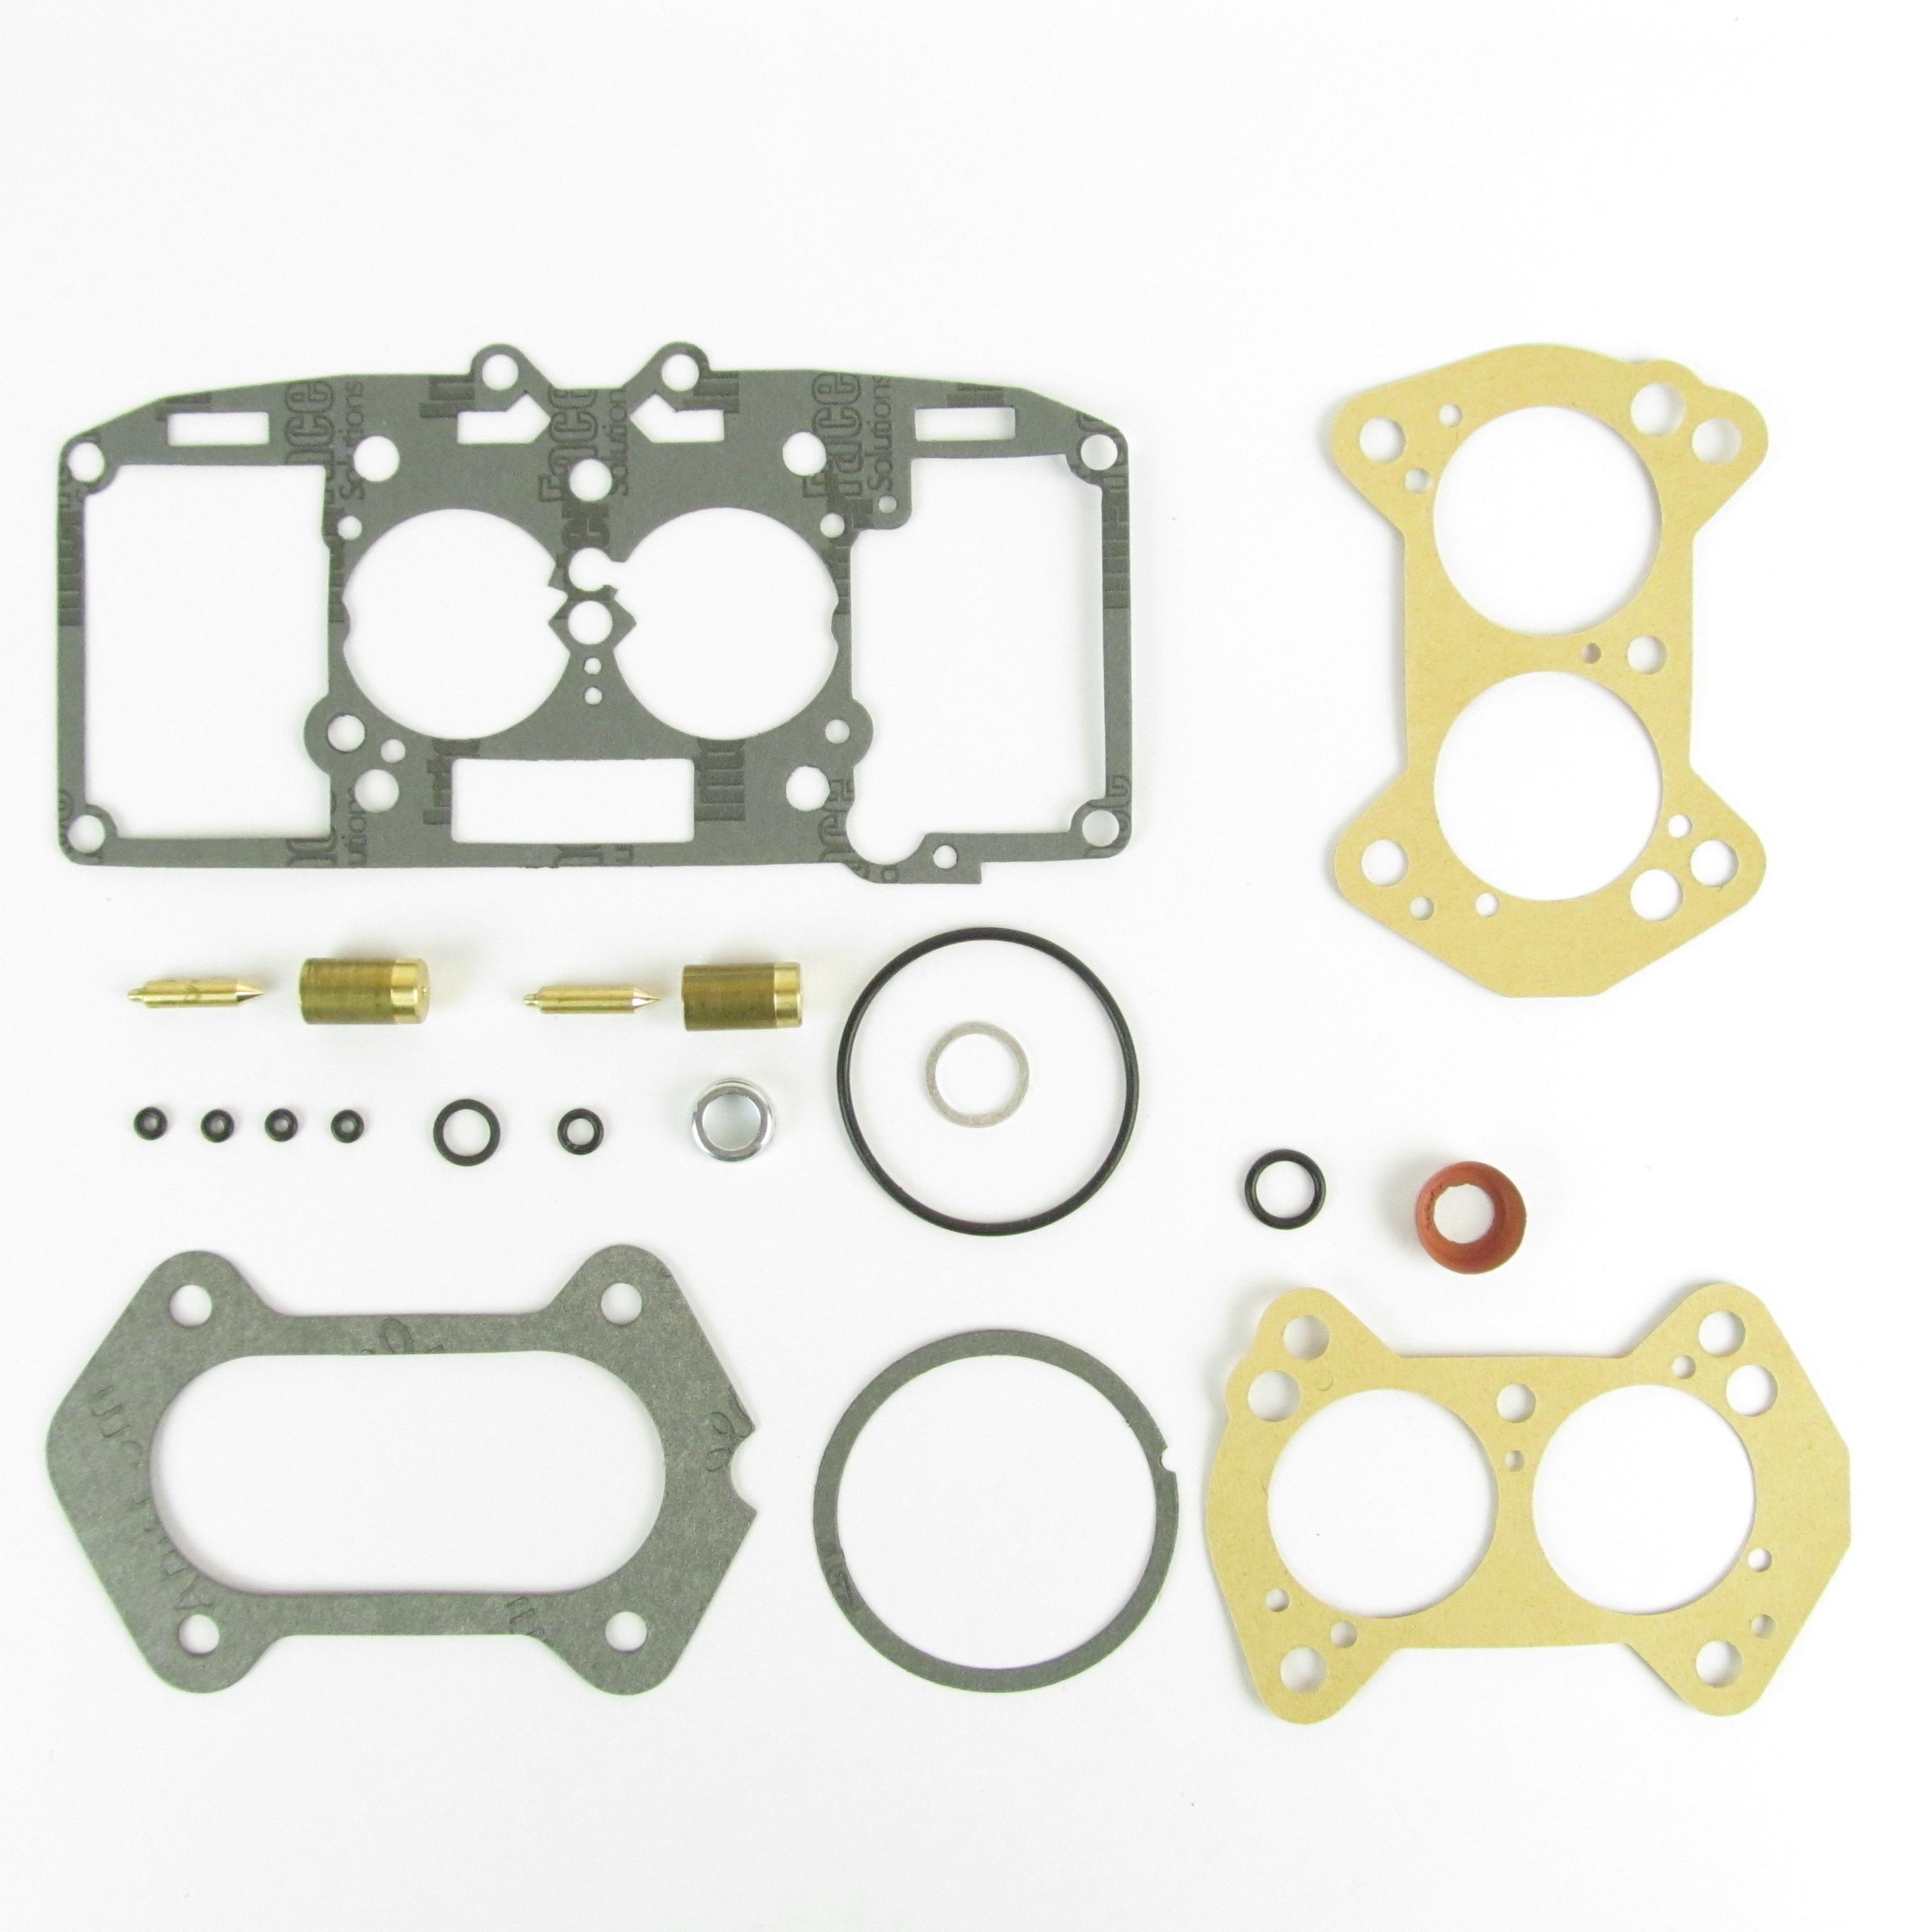 Pierburg 2B2/2B5 Carburettor Gasket/Repair/Service kit VOLVO/AUDI/VW